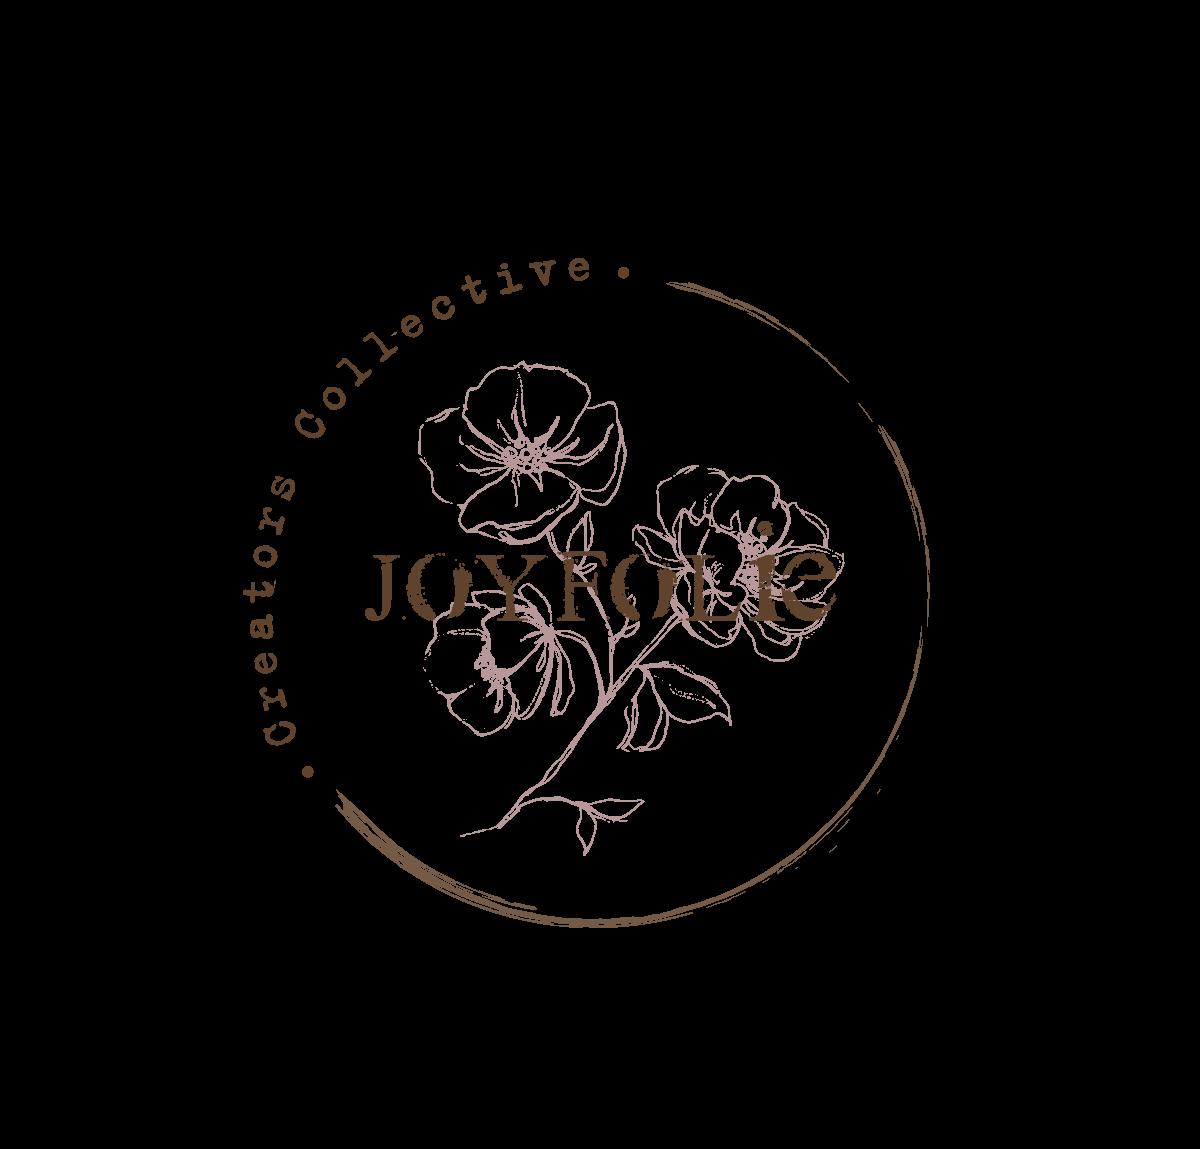 09-18-19-08-27-50_Joyfolie-photo-logoFINAL.png